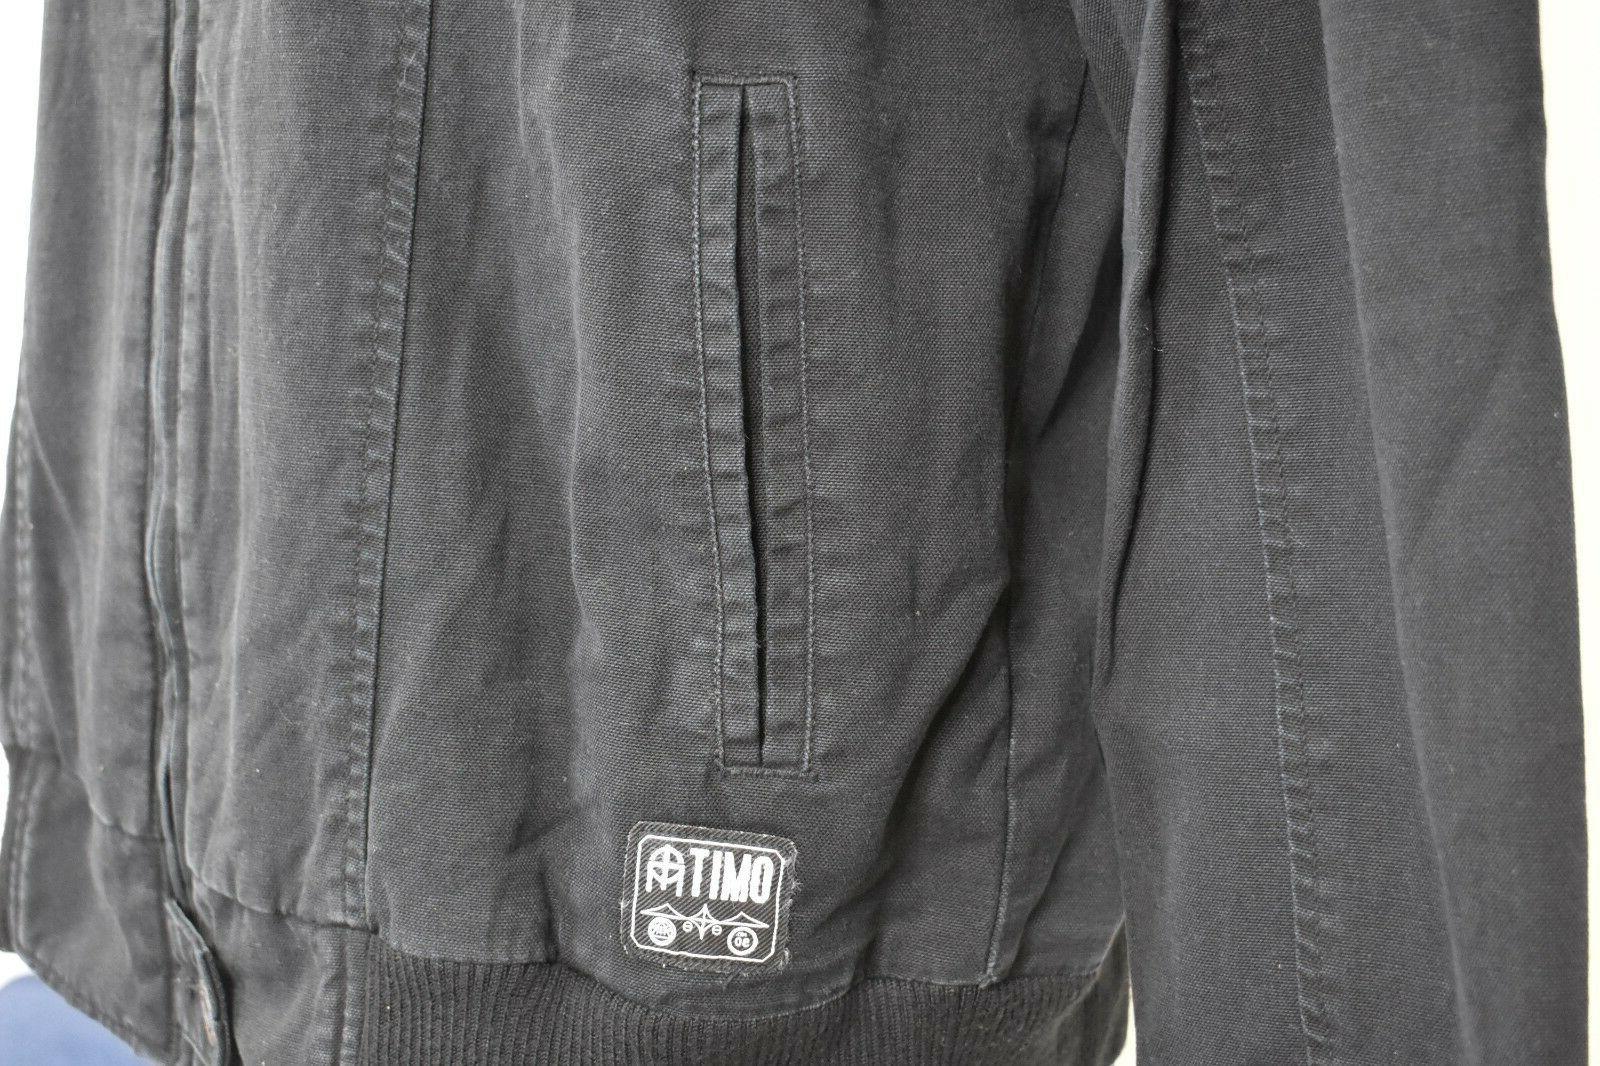 OMIT Mens Brand Jacket NWT